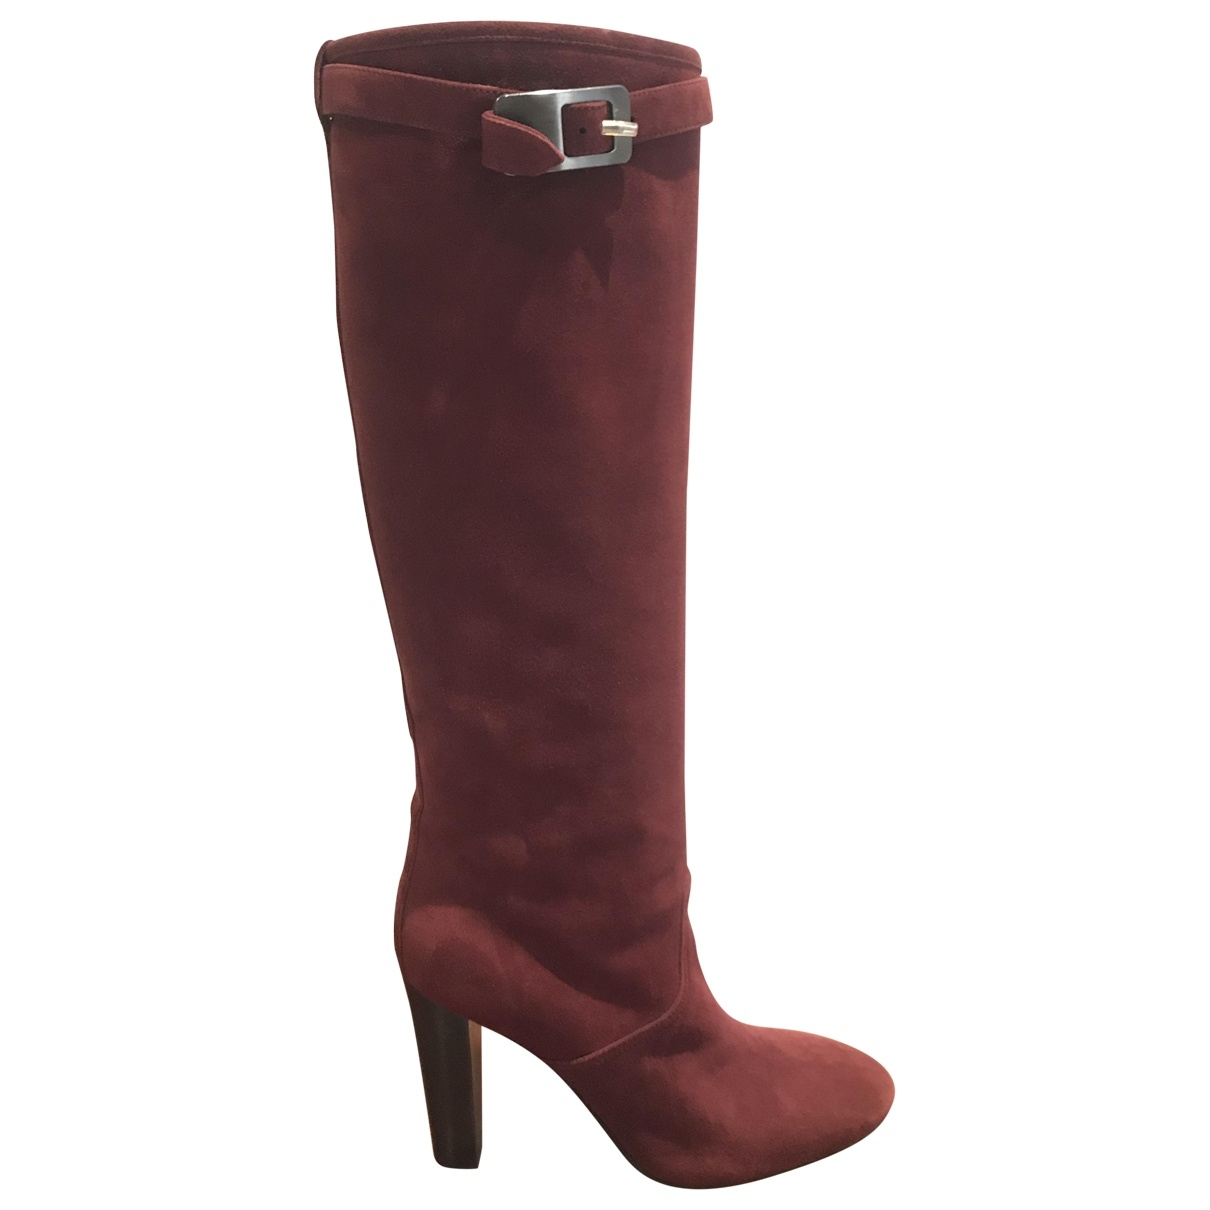 Hermès \N Burgundy Suede Boots for Women 36.5 EU